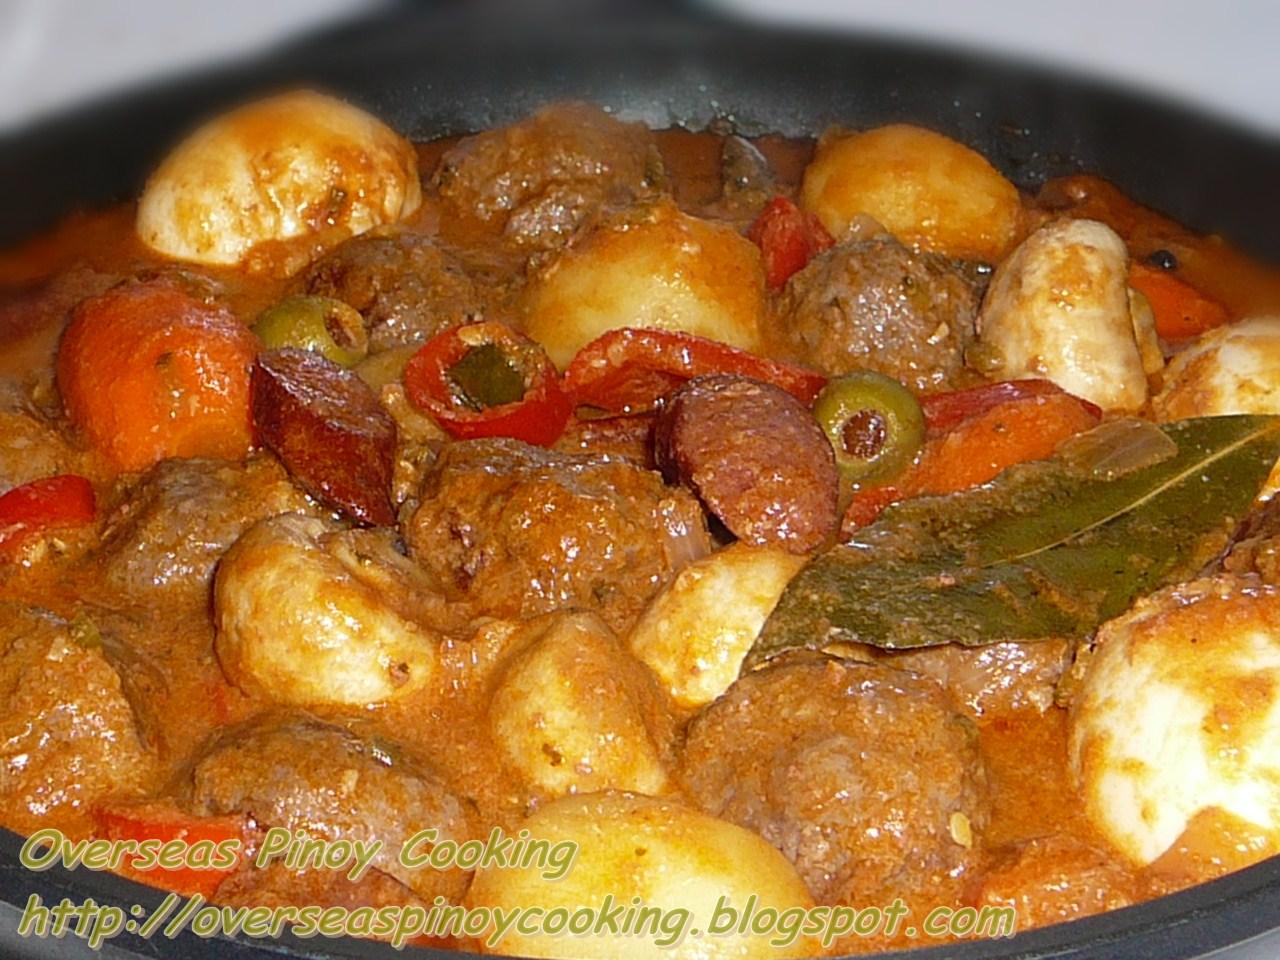 Overseas Pinoy Cooking: Beef Meatballs Kaldereta